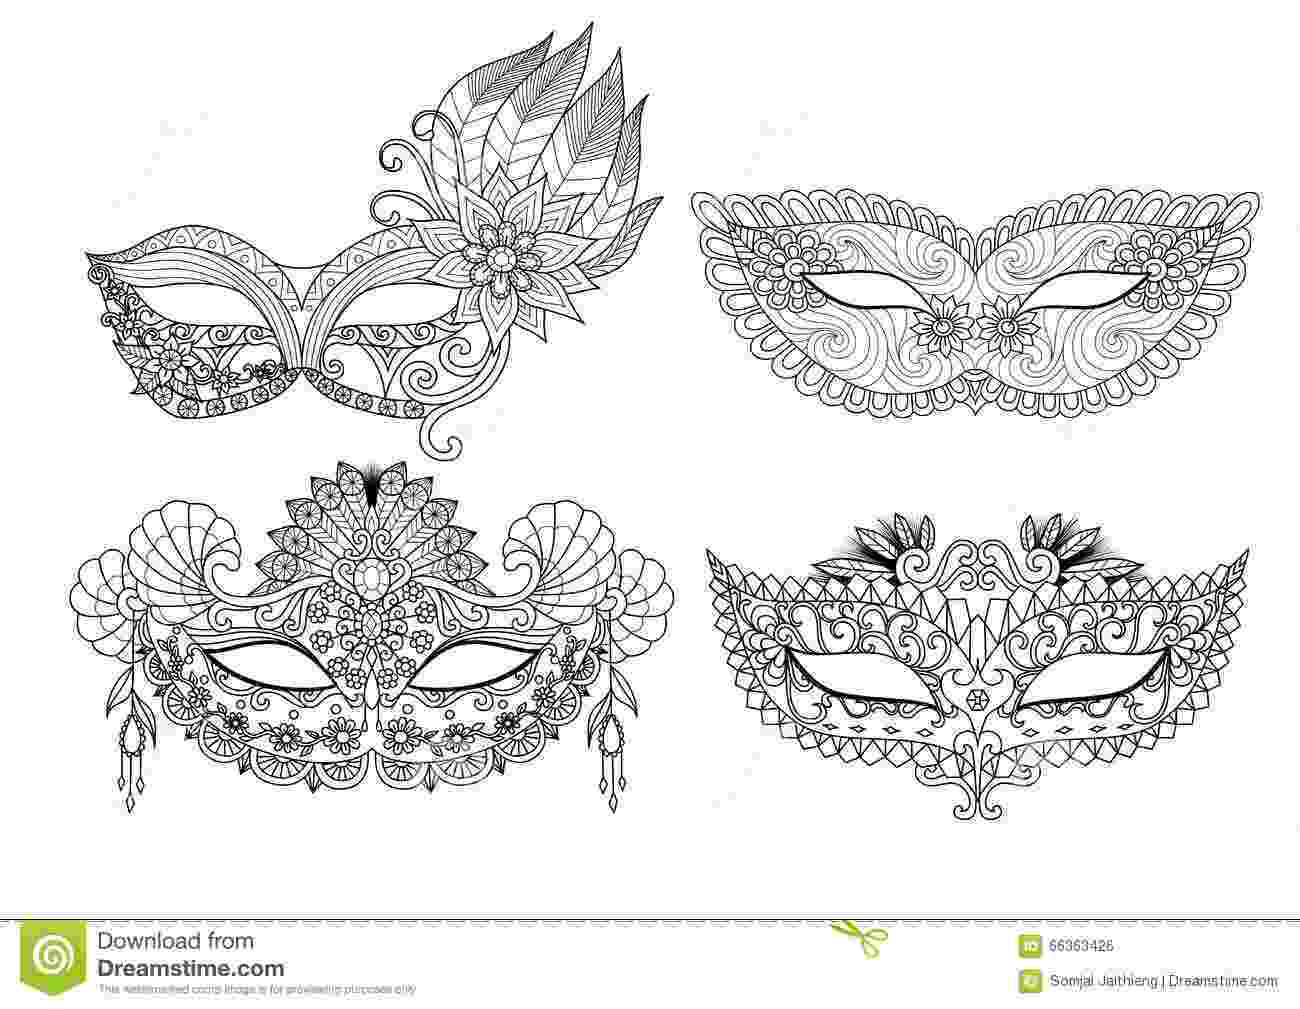 carnival mask coloring page máscara de carnaval para colorir ilustração vetorial carnival mask page coloring